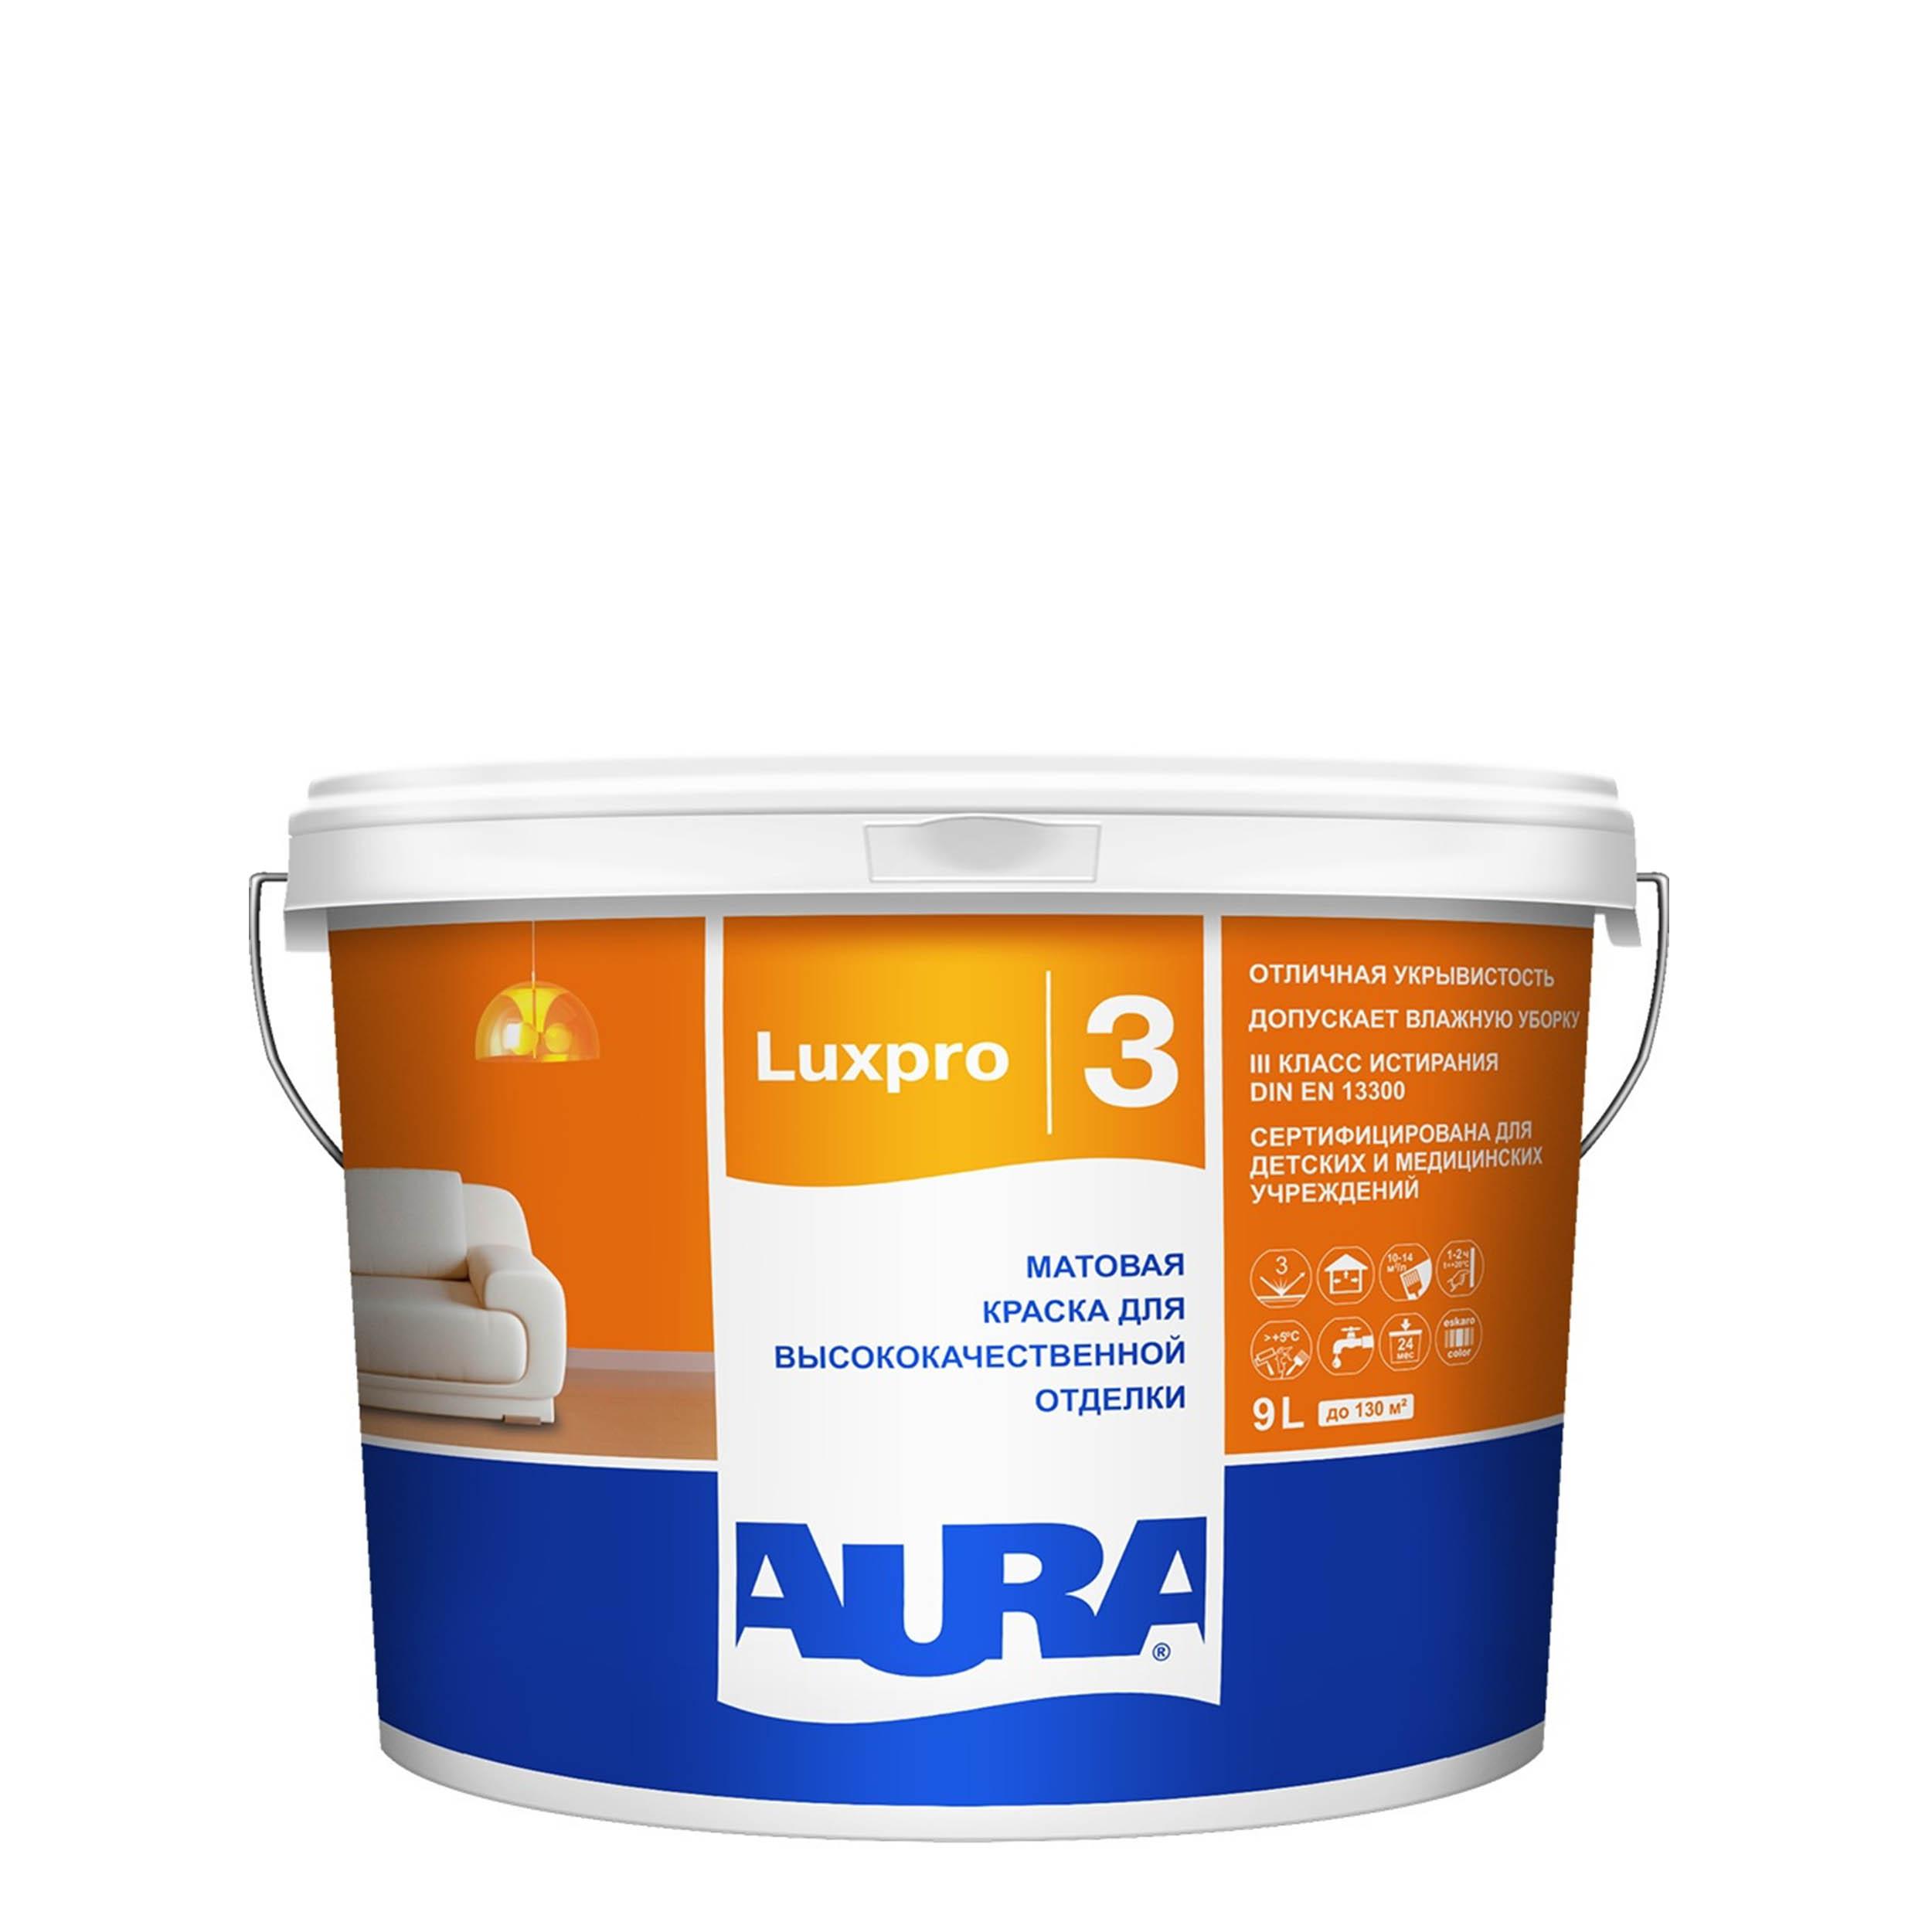 Фото 4 - Краска интерьерная, Aura LuxPRO 3, RAL 5014, 11 кг.